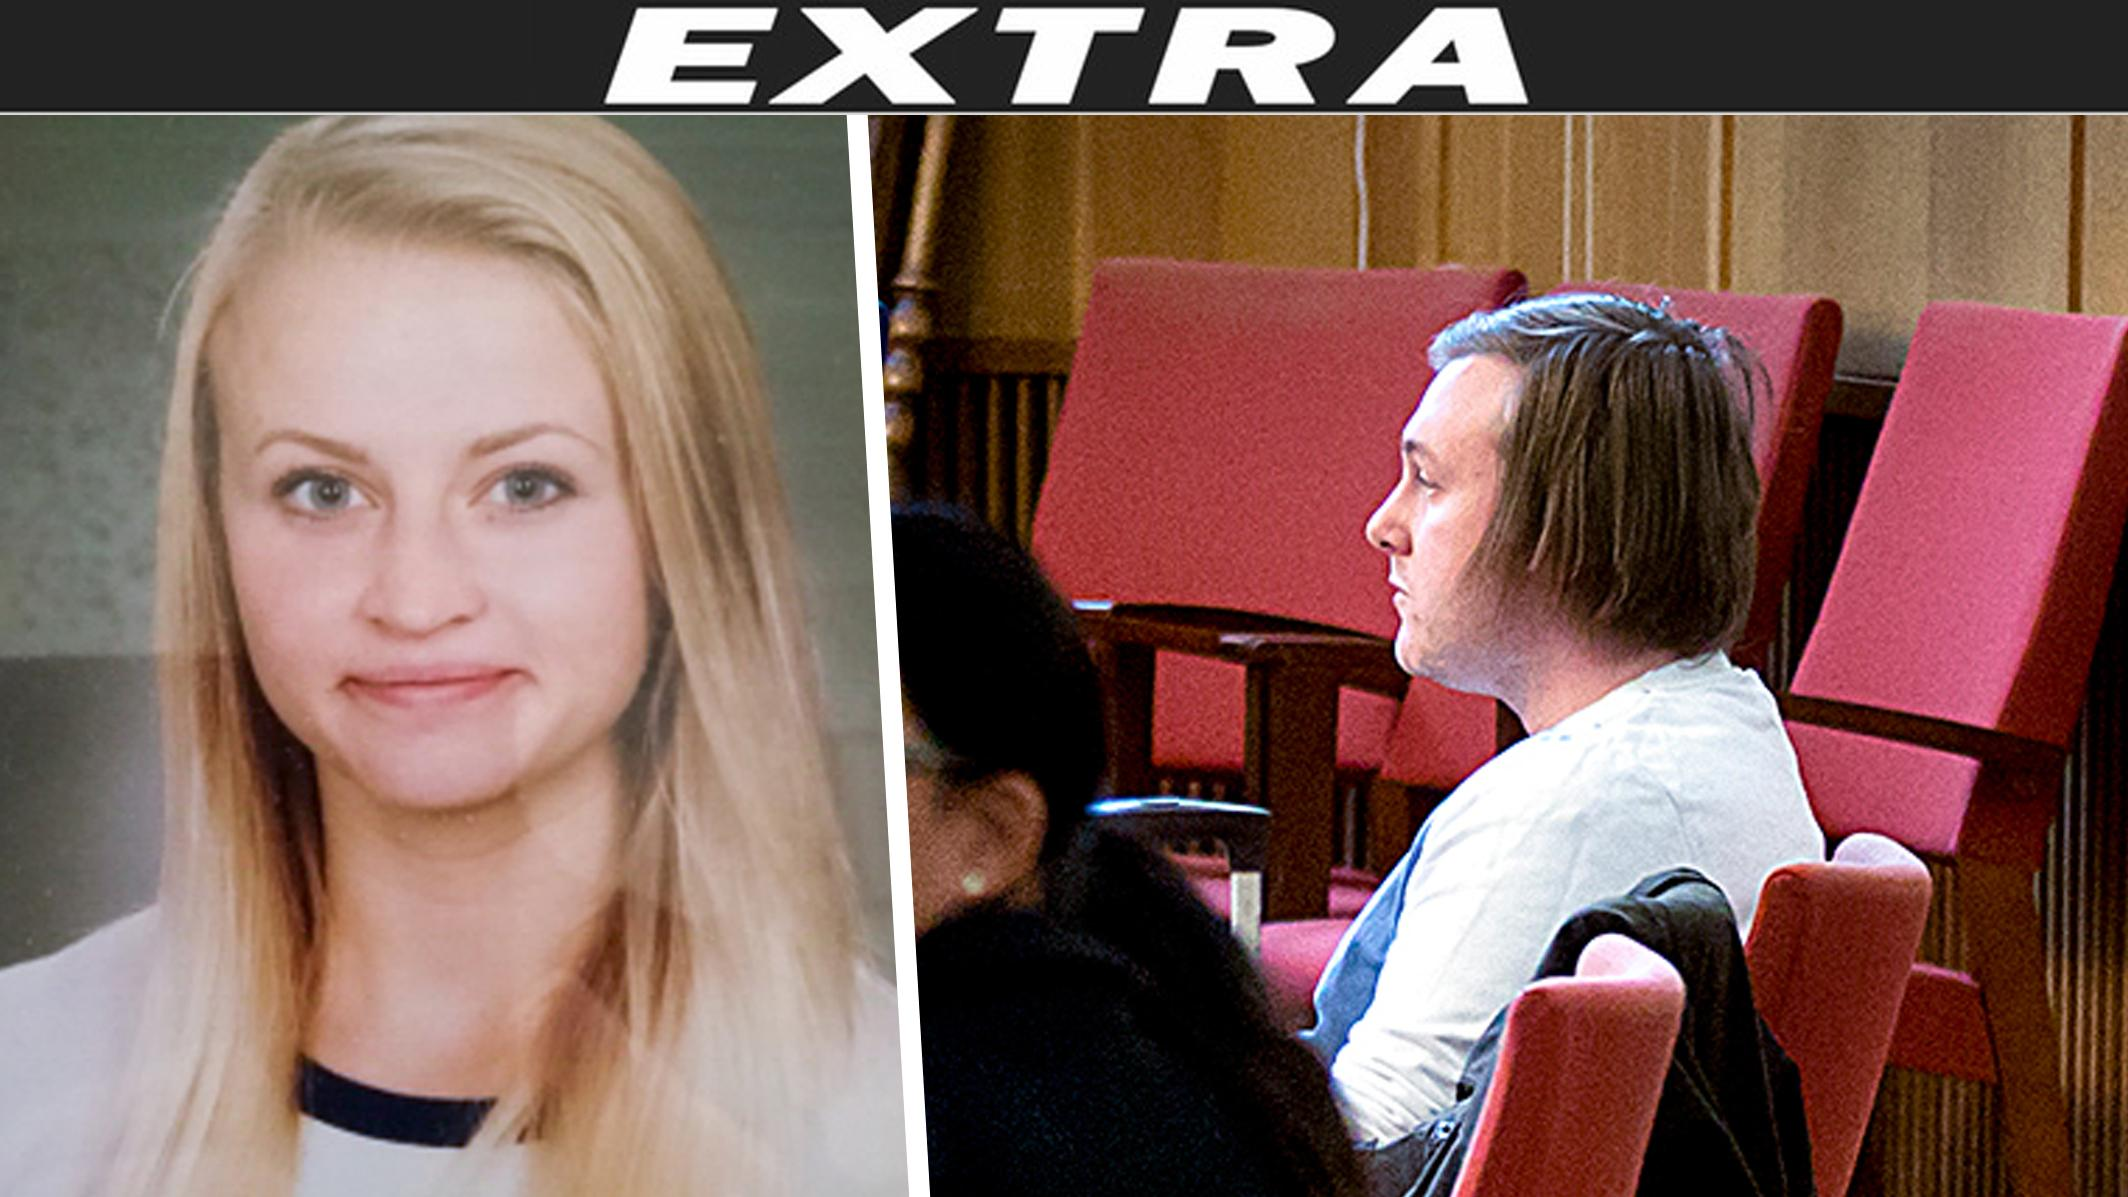 Tova mobergs mordare kan domas till fangelse